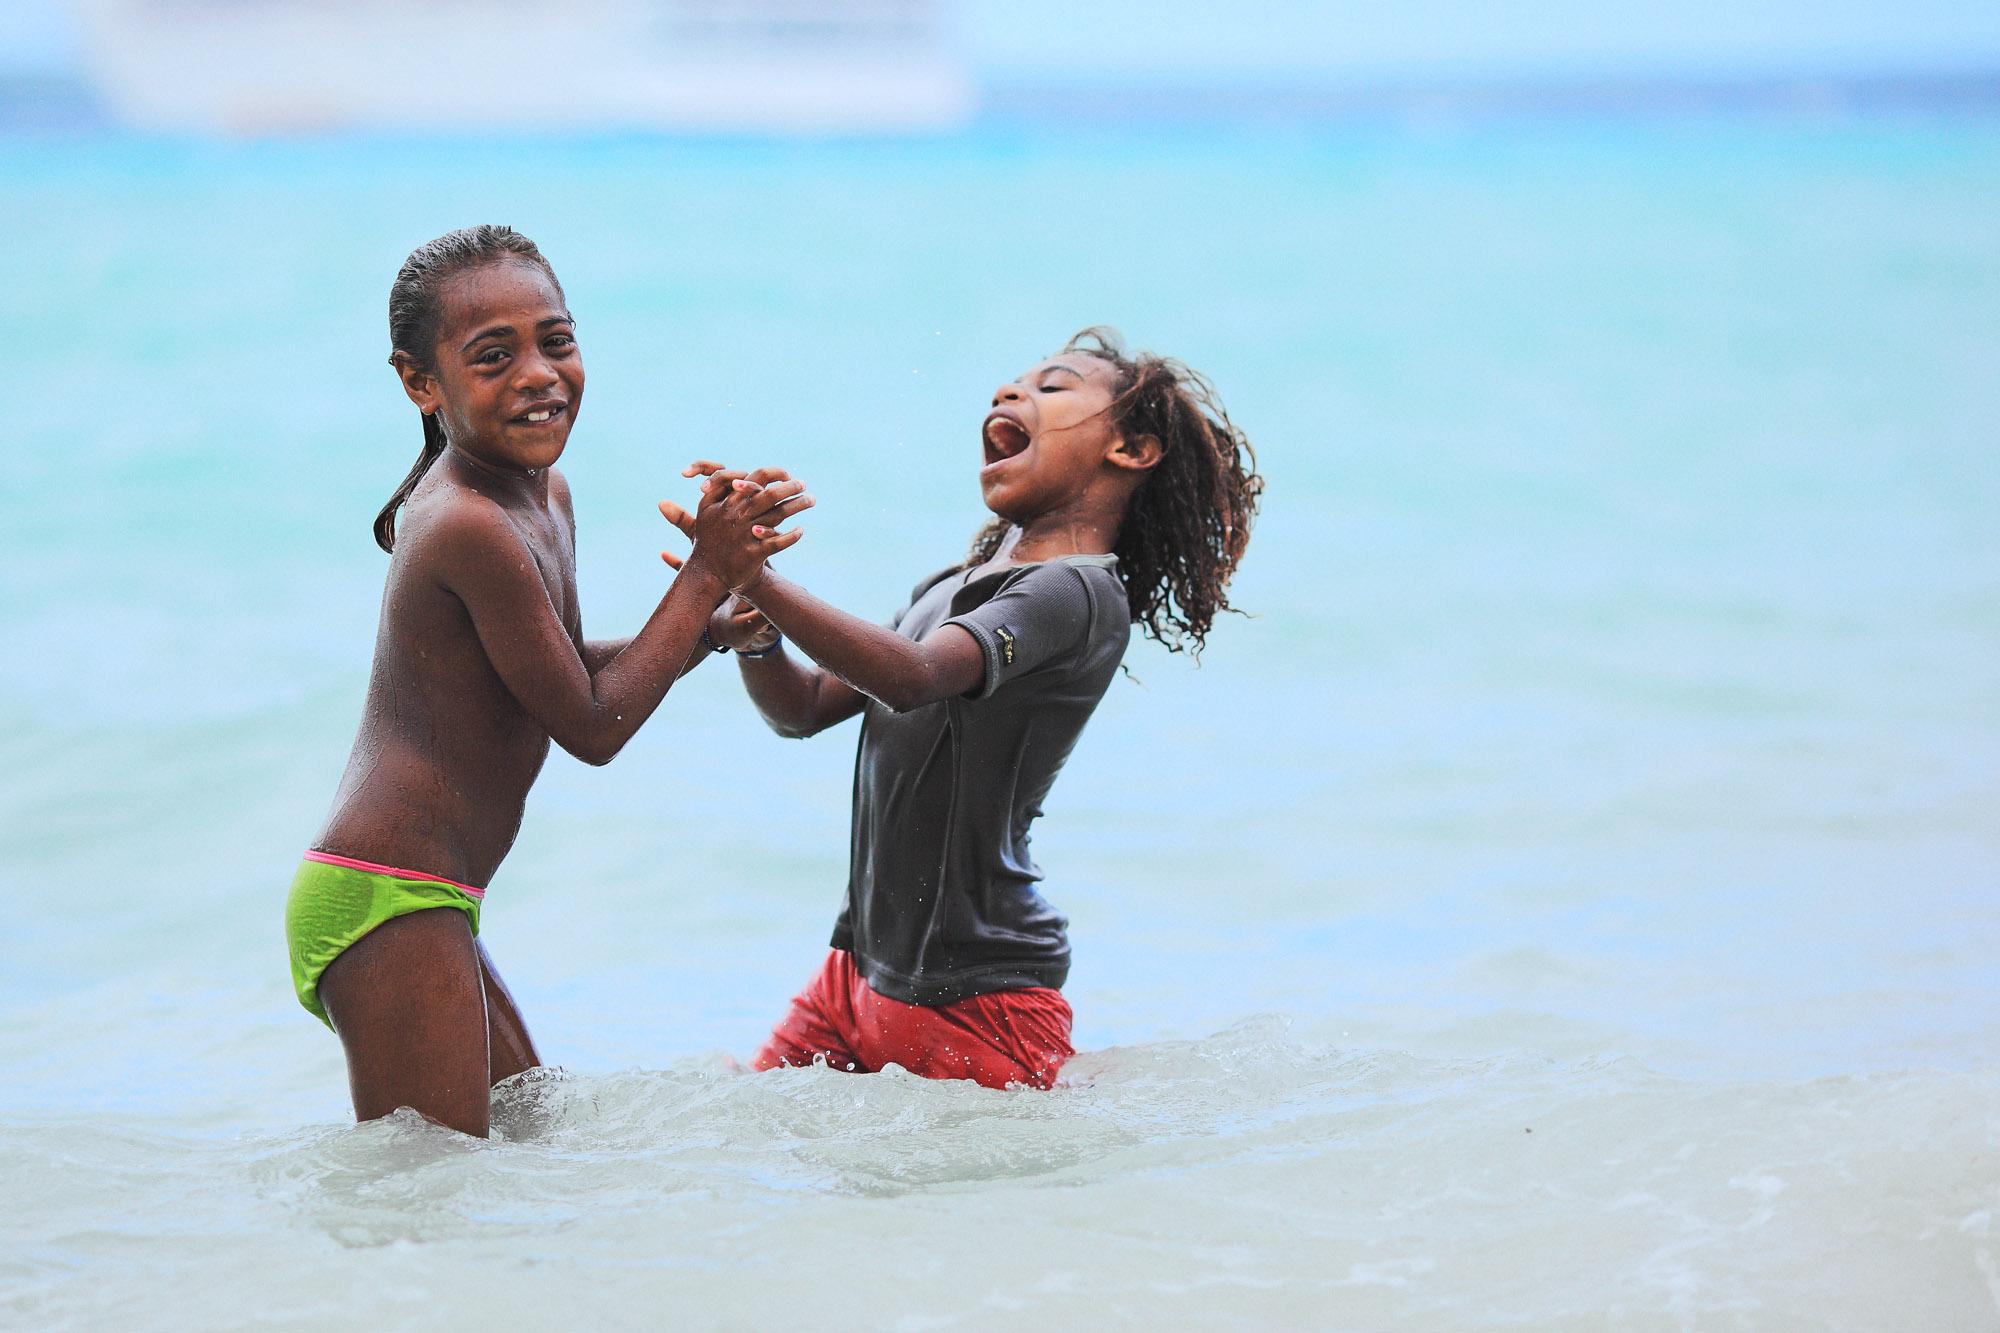 4. George Suresh - New Caledonia - Low Res.jpg